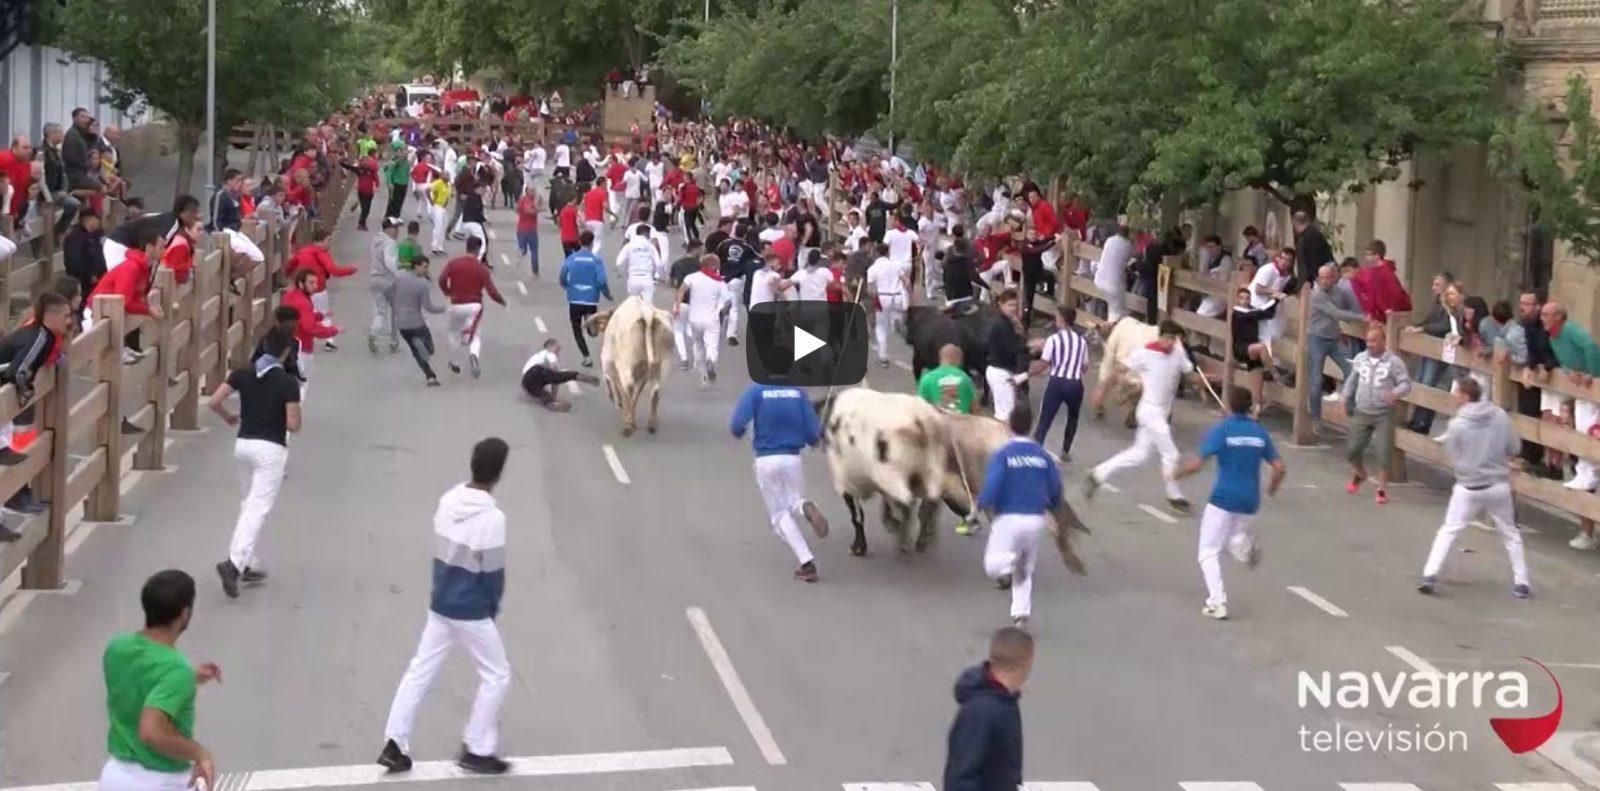 VIDEO // Encierro del Pilon de Falces et TAFALLA // Retour en vidéo sur les encierros du week end